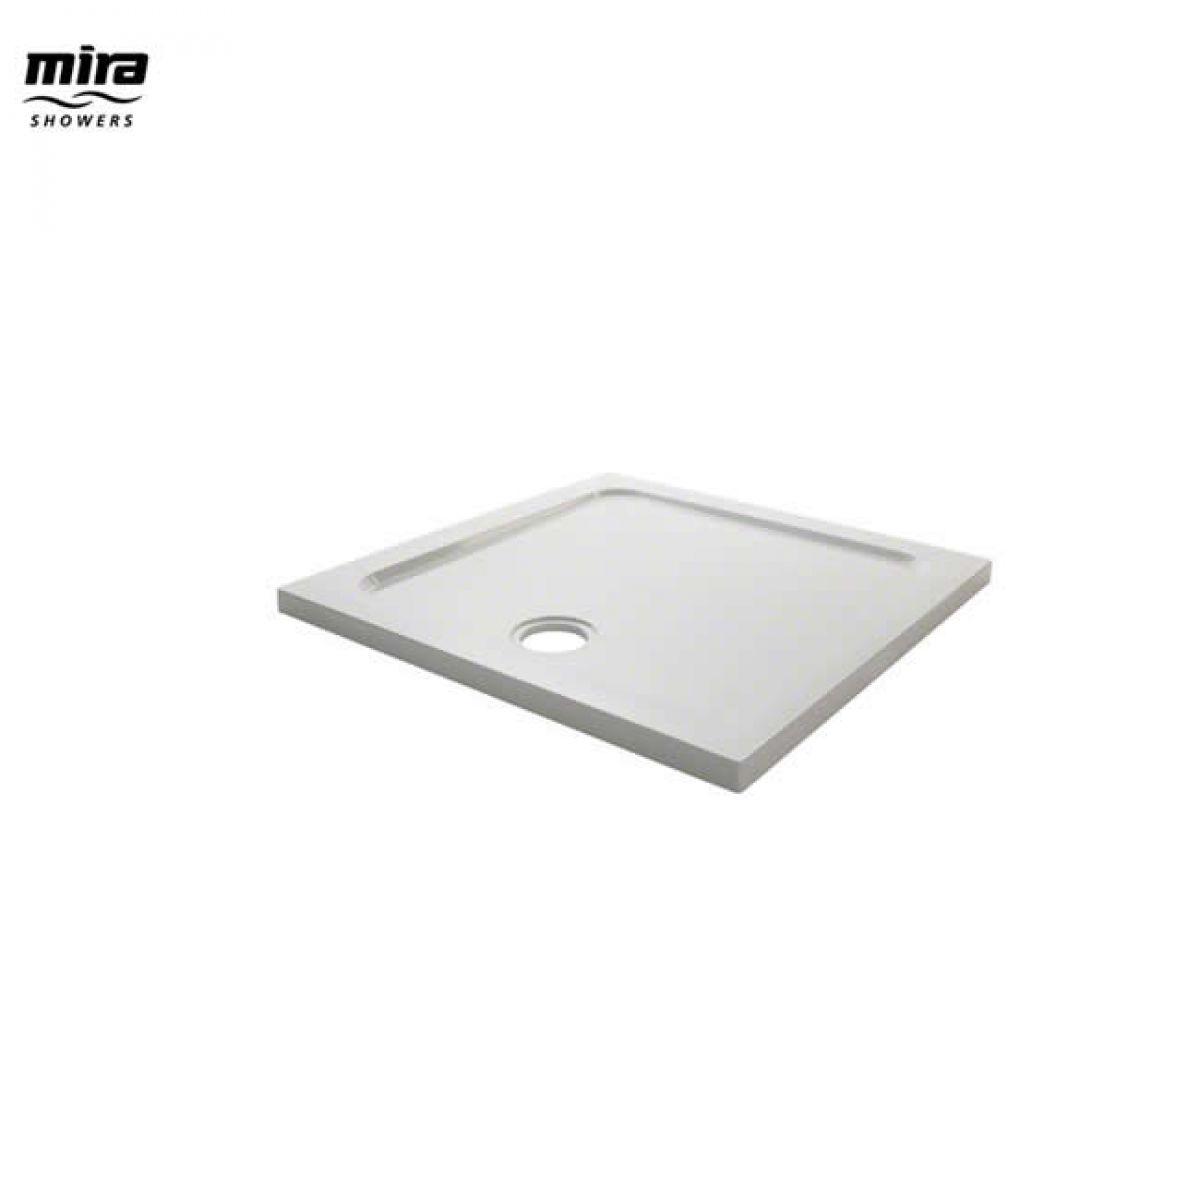 Mira Flight Safe Antislip Square Shower Tray